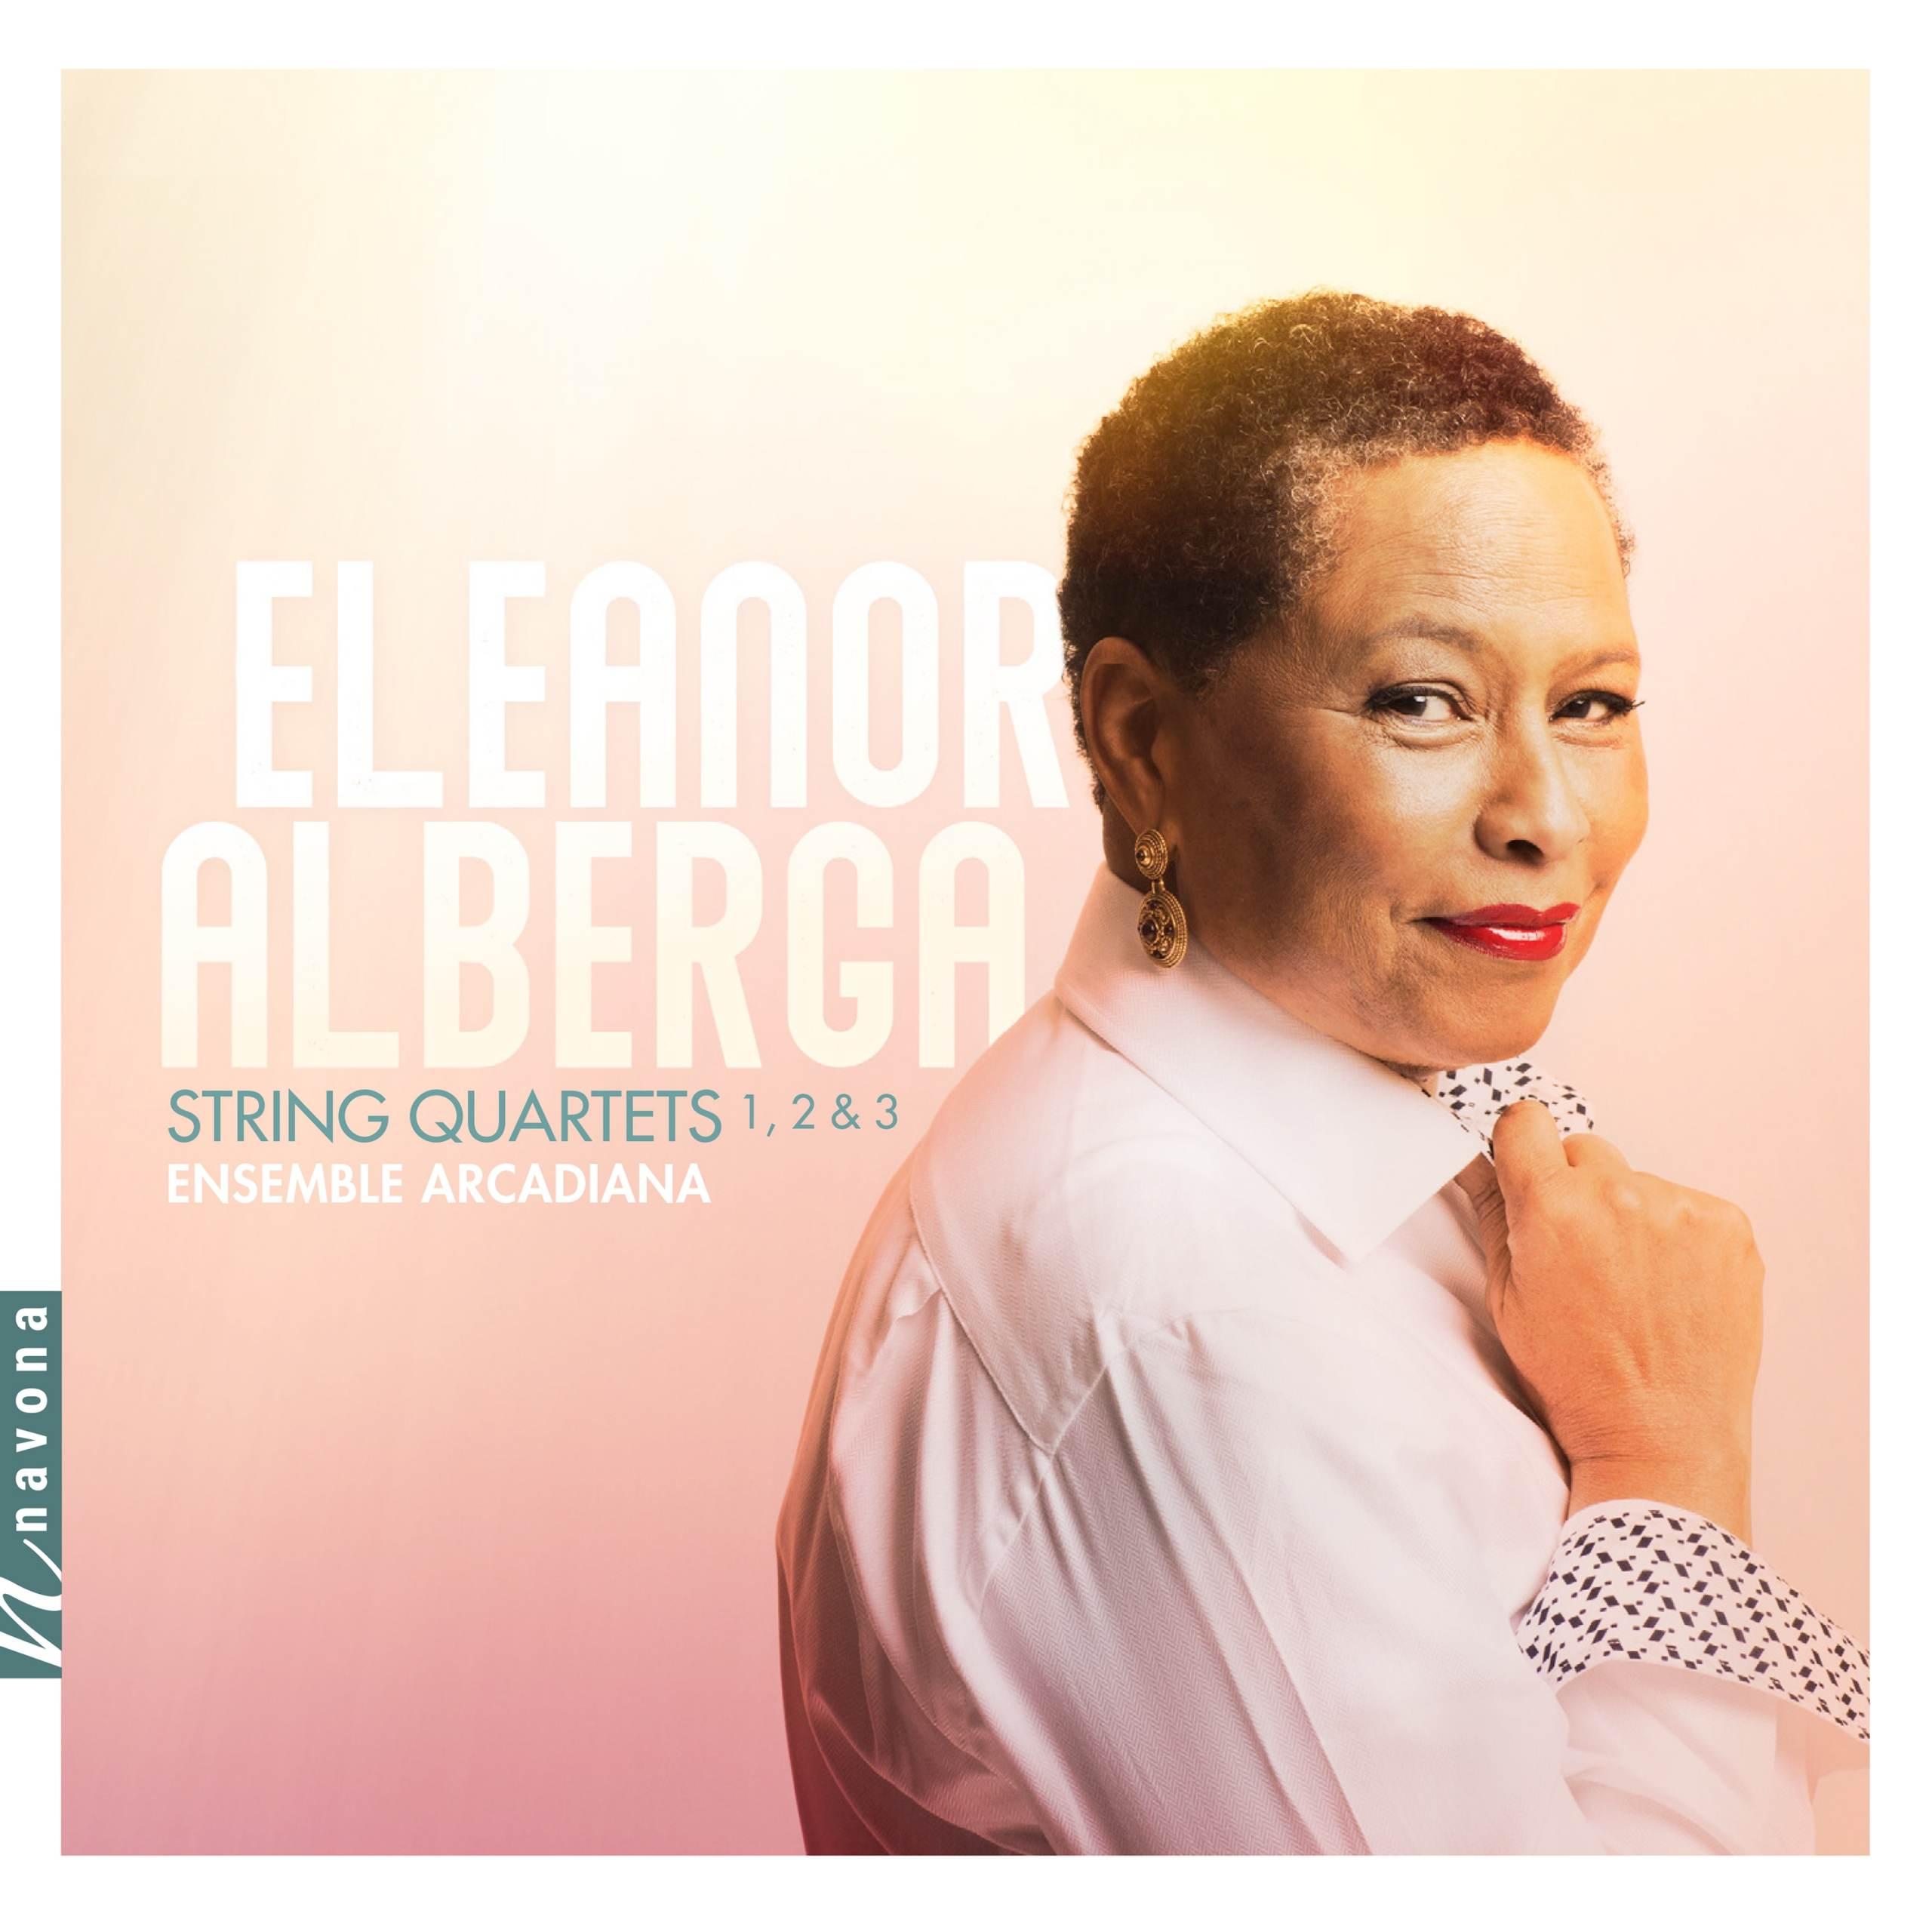 String Quartets - Eleanor Alberga - album cover